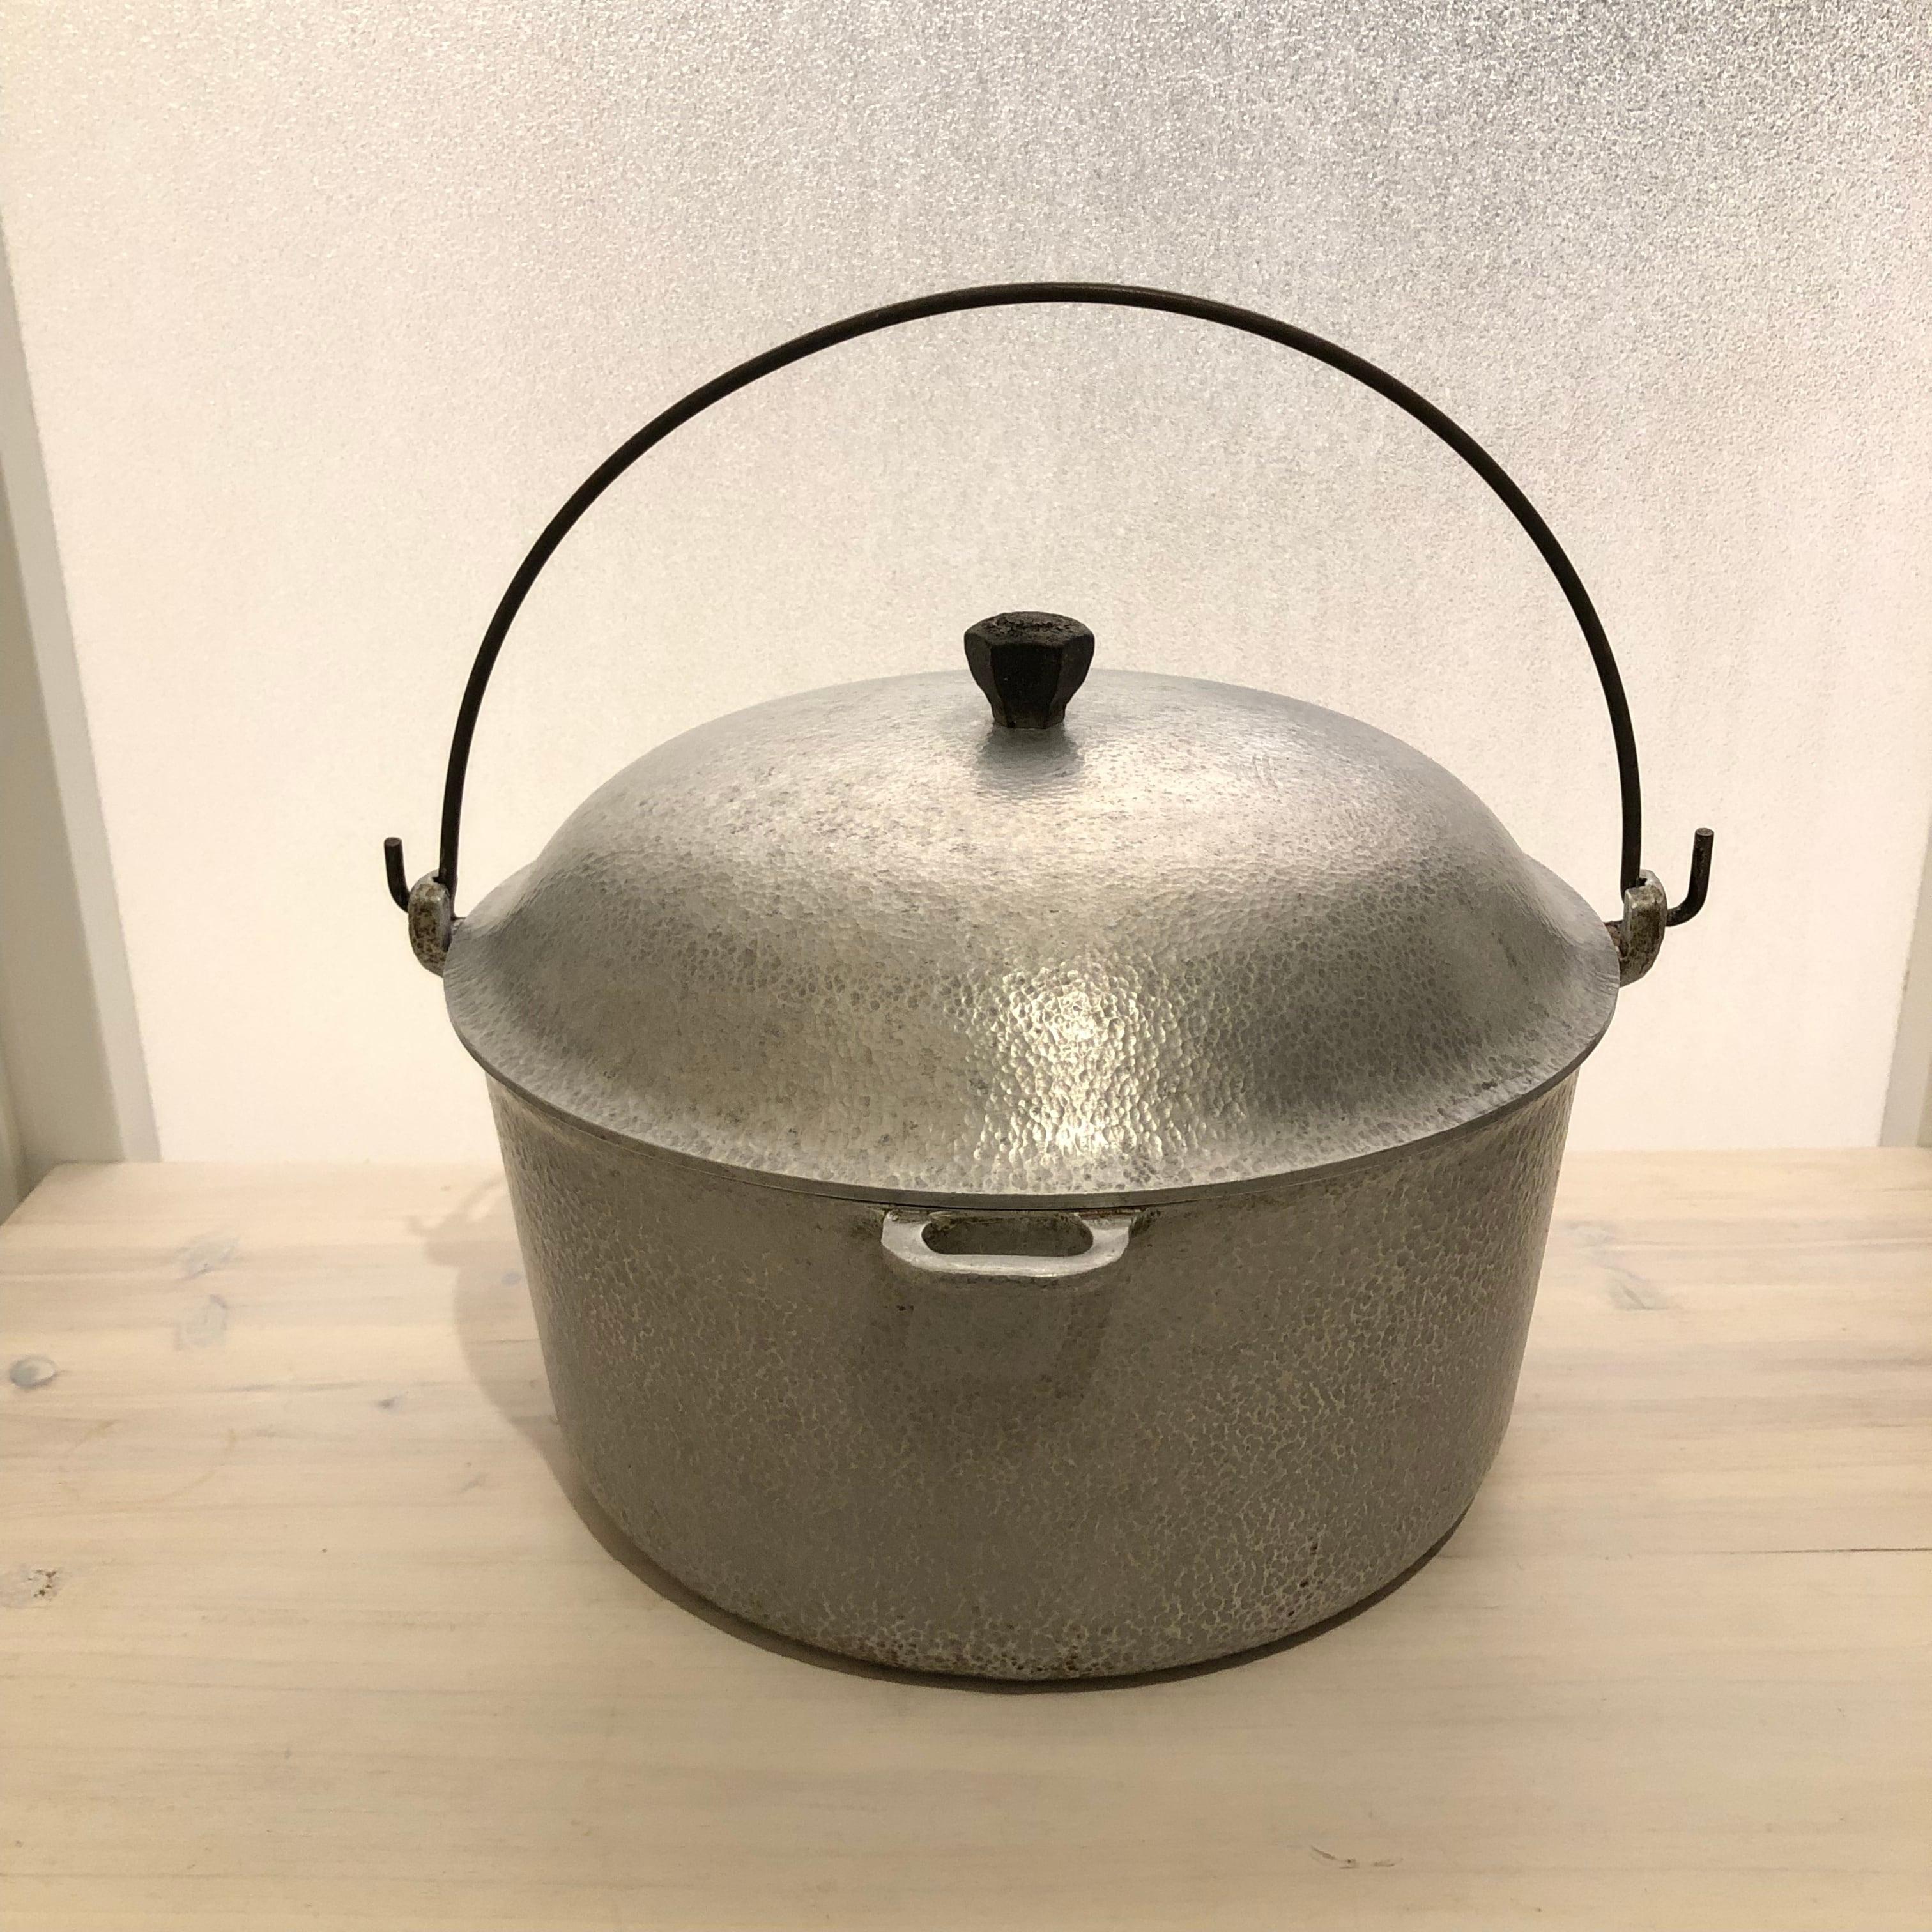 Hummer Craft 社 ダッチオーブン的お鍋